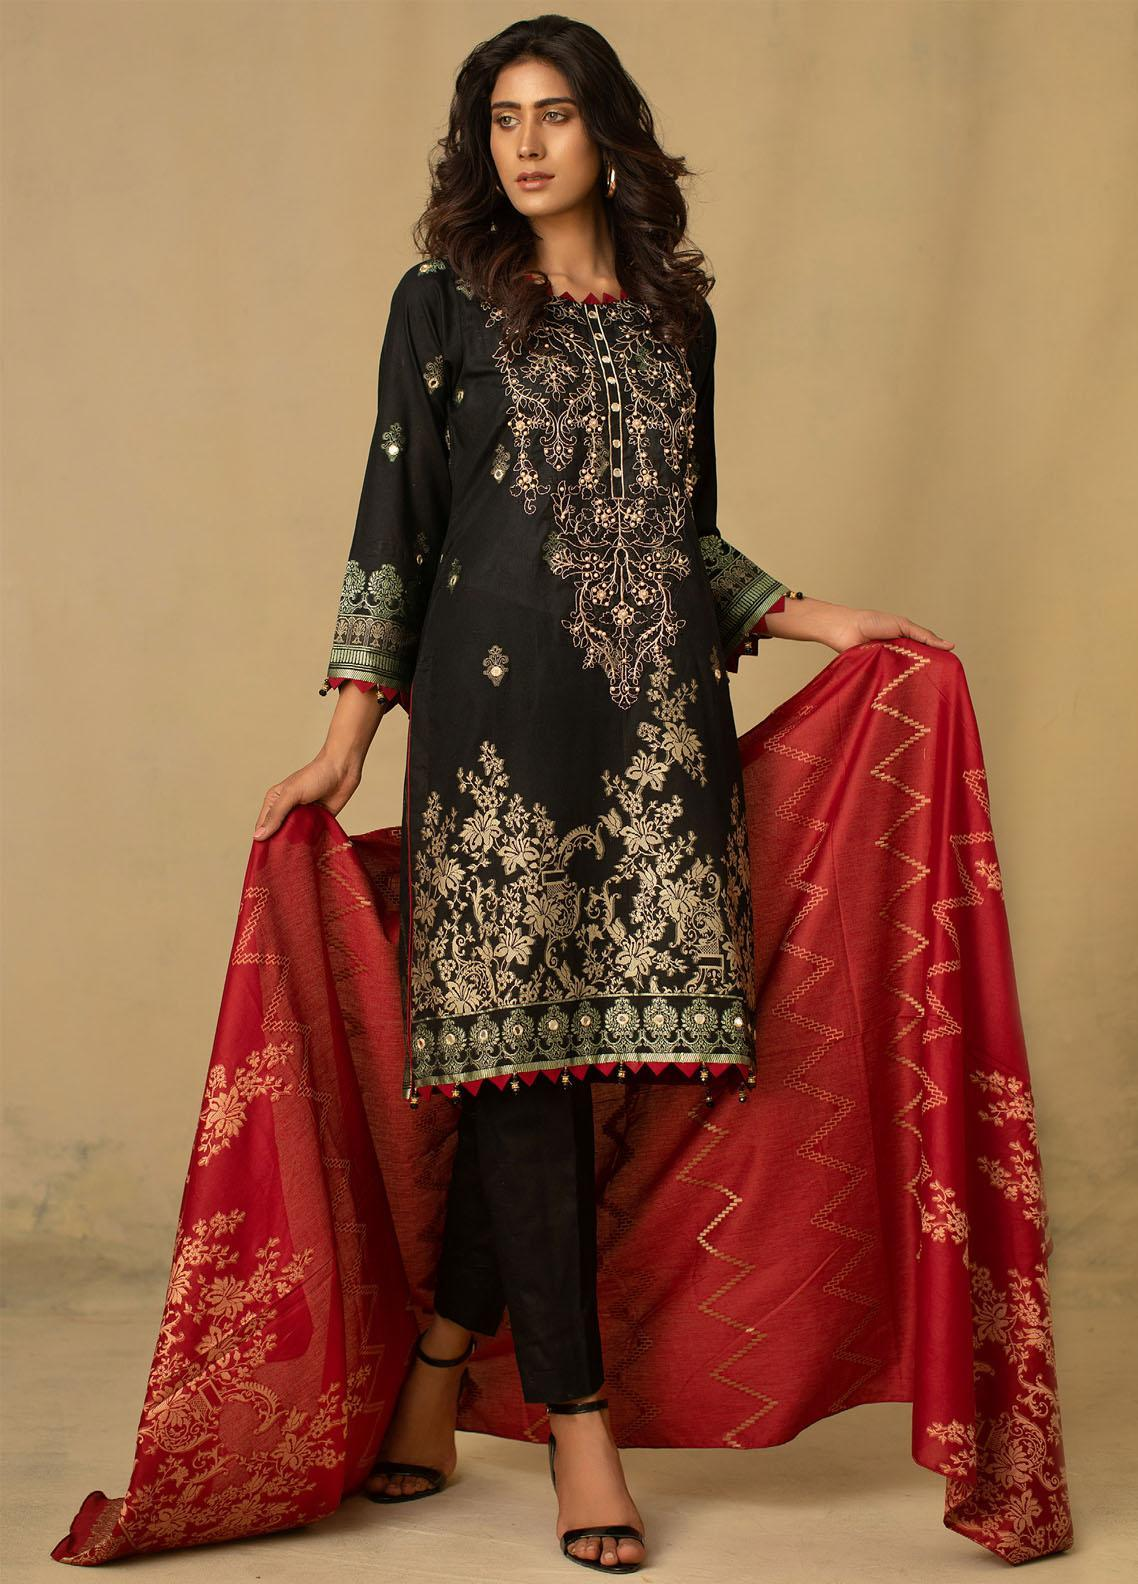 Jahan by AB Textiles Embroidered Jacquard Unstitched 3 Piece Suit AB21JCR 03 Noire - Casual Collection